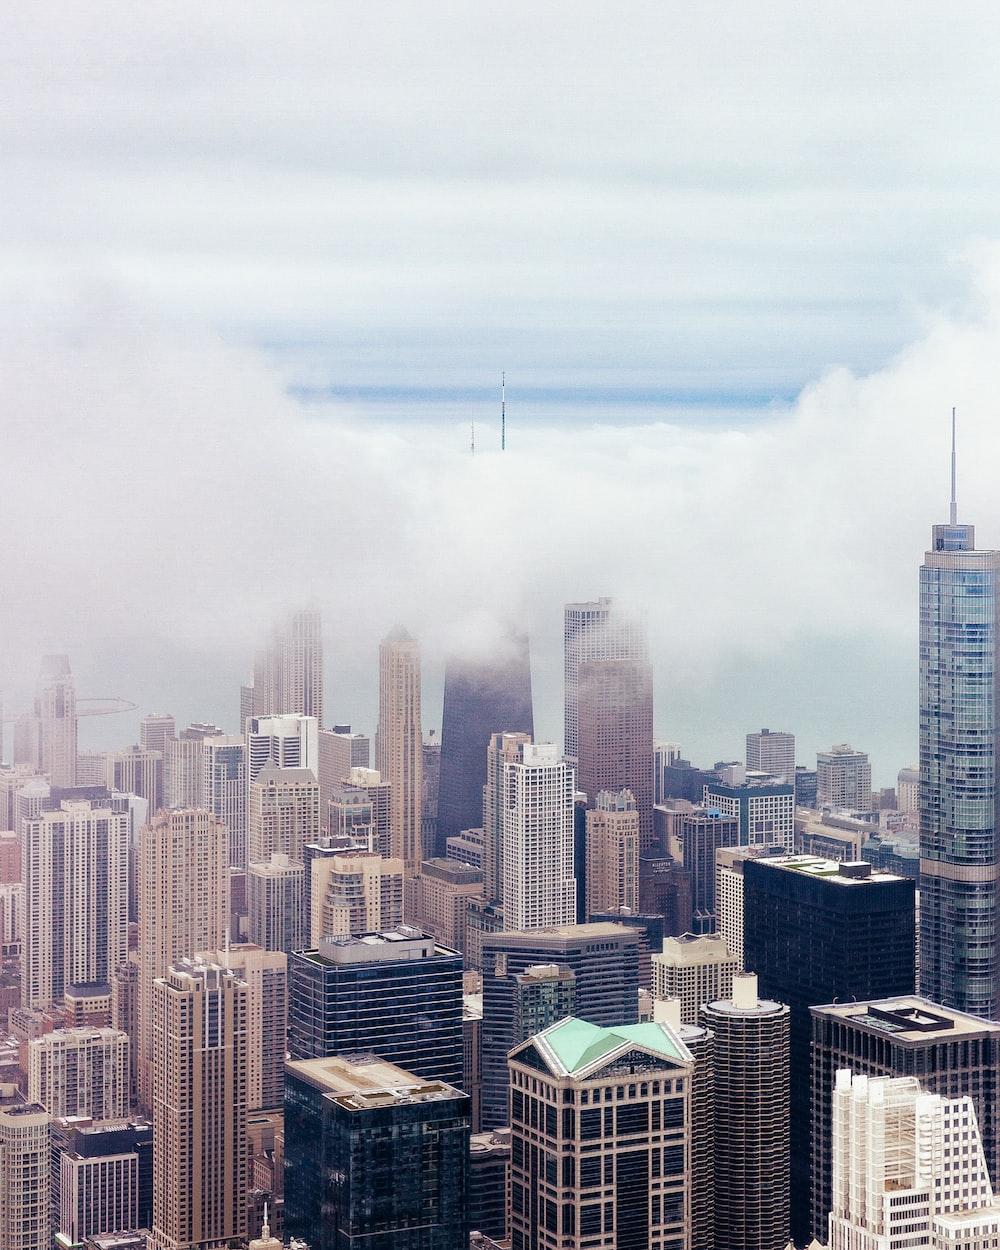 skyscrapers under cloudy sky